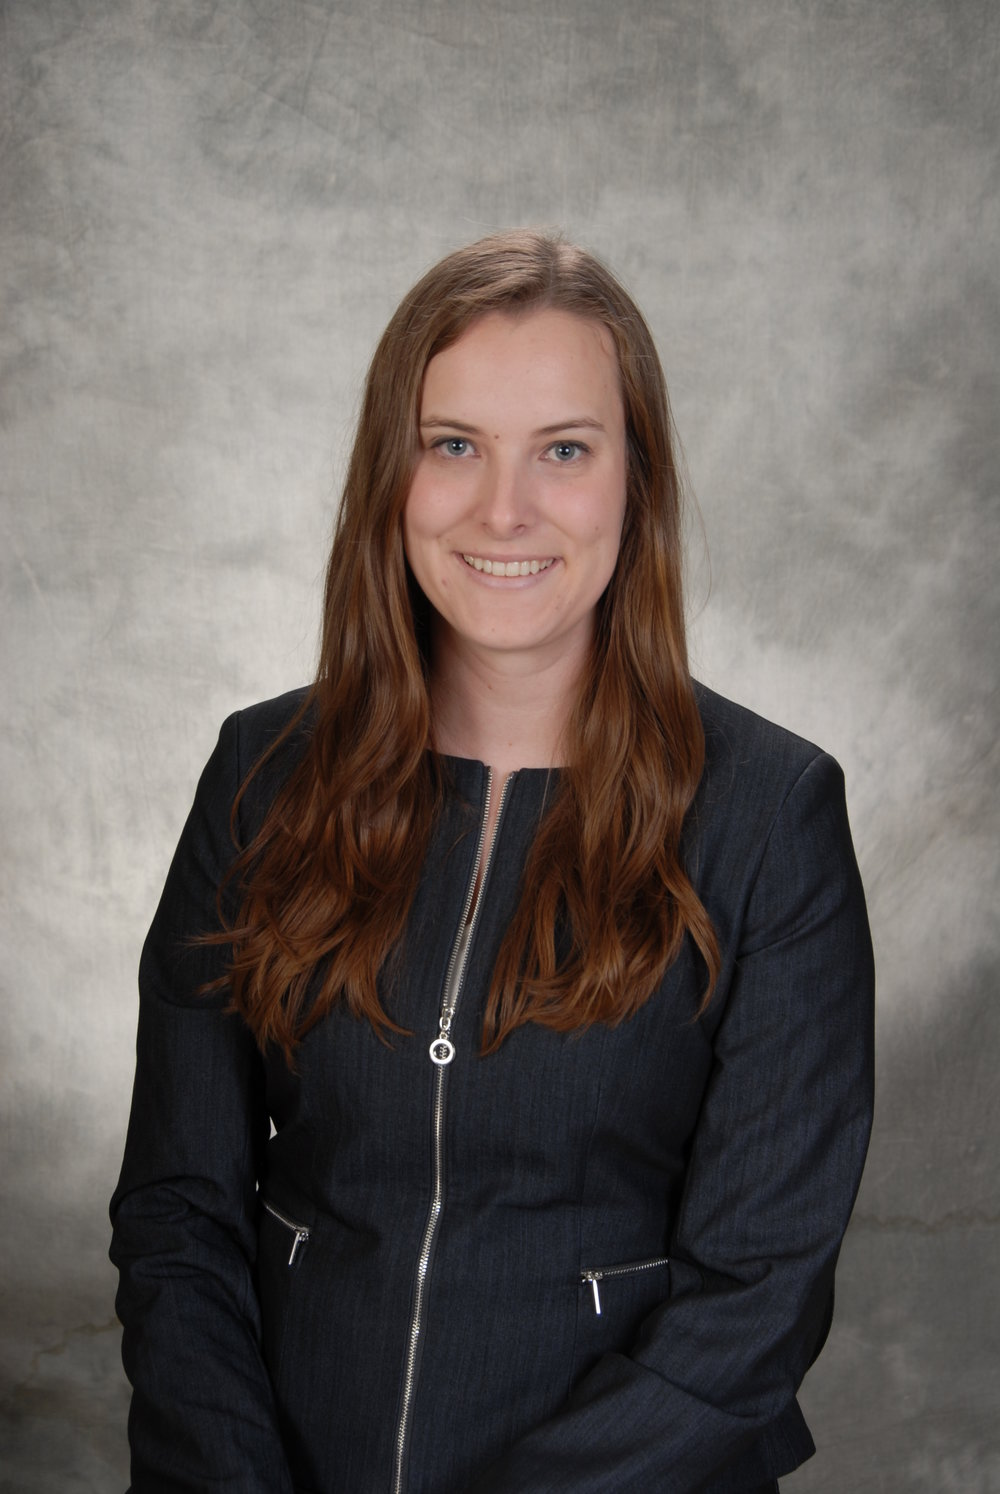 Brittany Voth - VP of Community Service